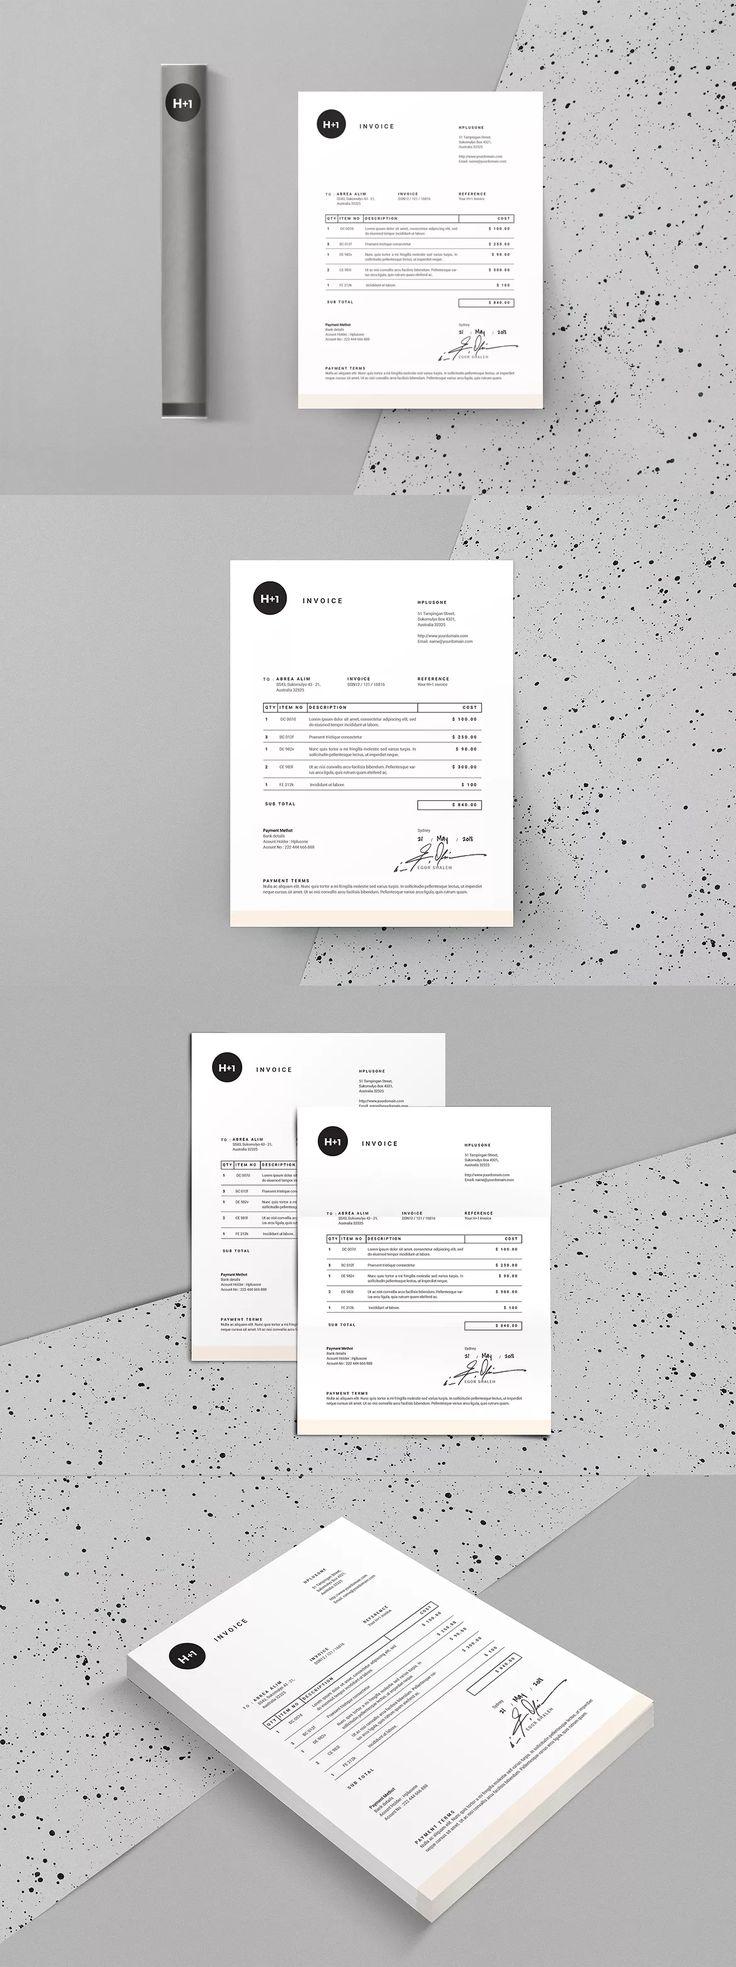 Mejores 34 imágenes de Invoice Templates en Pinterest | Plantilla de ...